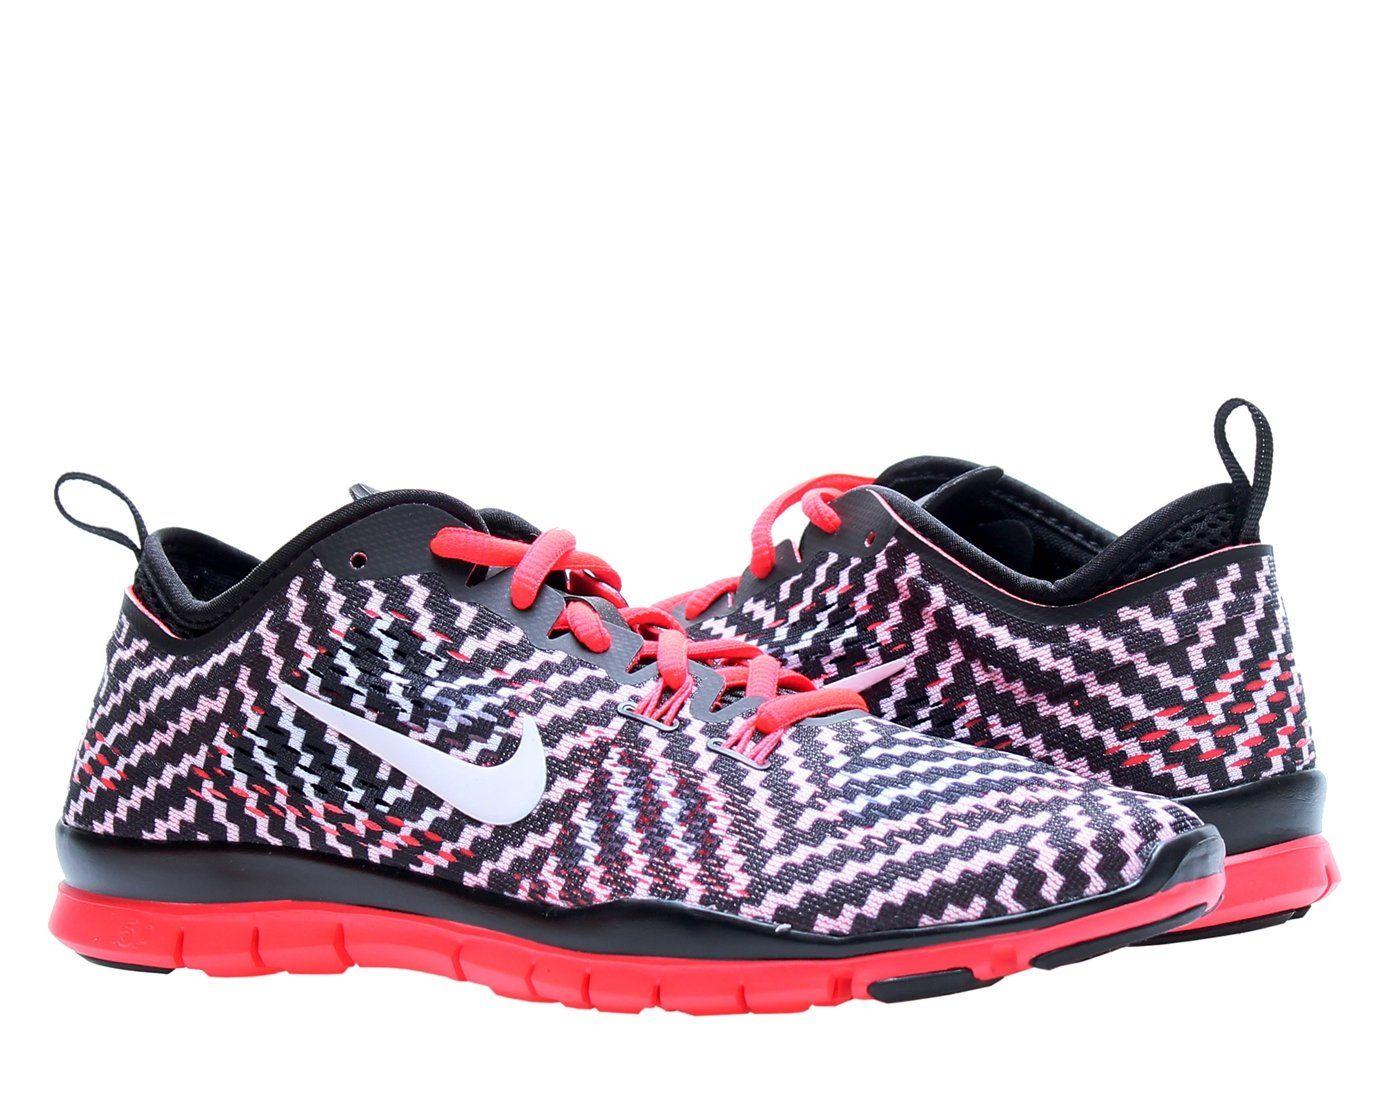 new style 0cbd4 fa780 ... reduced nike womens free 5.0 tr fit 4 print cross training shoes black  white laser 2f516